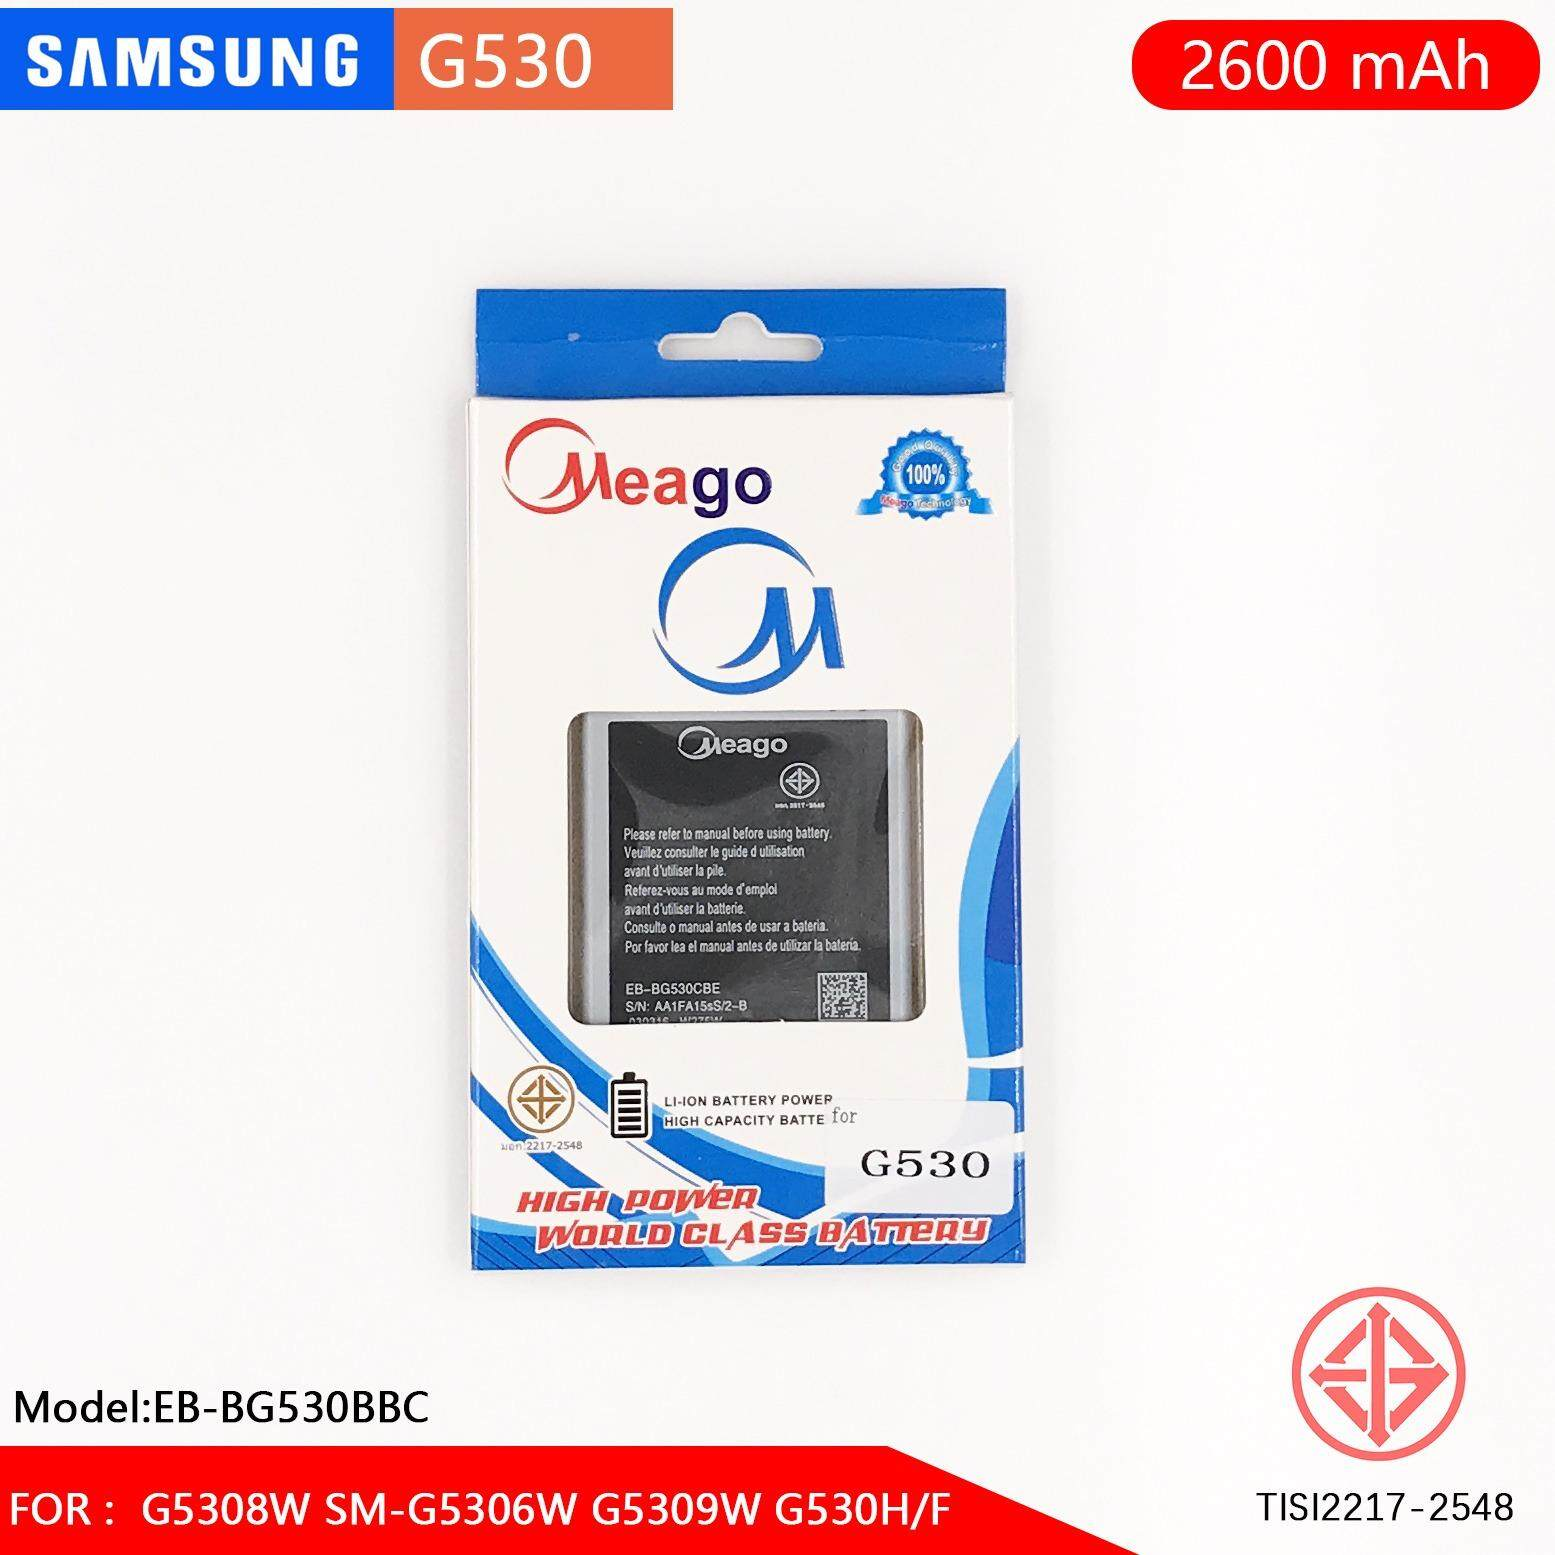 Meago Phone Battery For Samsung Galaxy Grand Prime Sm G530 2600 Mah แบตเตอรี่ทดแทนสำหรับซัมซุง ความจุ 2500 มิลลิแอมป์ รหัสรุ่น ซัมซุง Samsung G5308W 5306W 5309W ใน ไทย